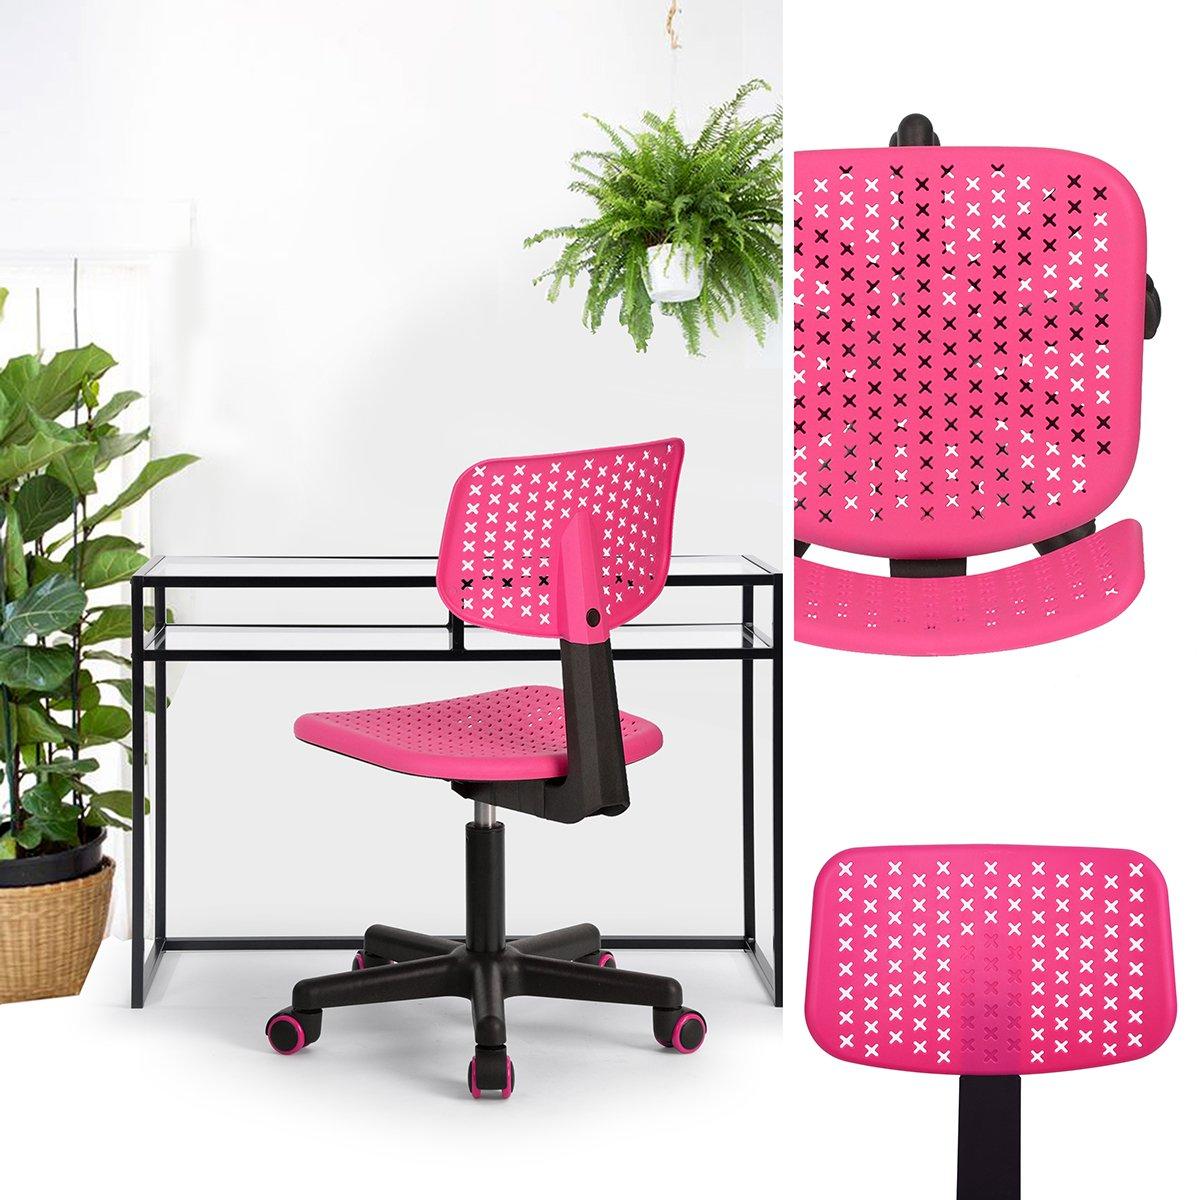 FurnitureR Kids Low-Back Adjustable Computer Seat Office Desk Task Swivel Armless Children Study Chair, Pink